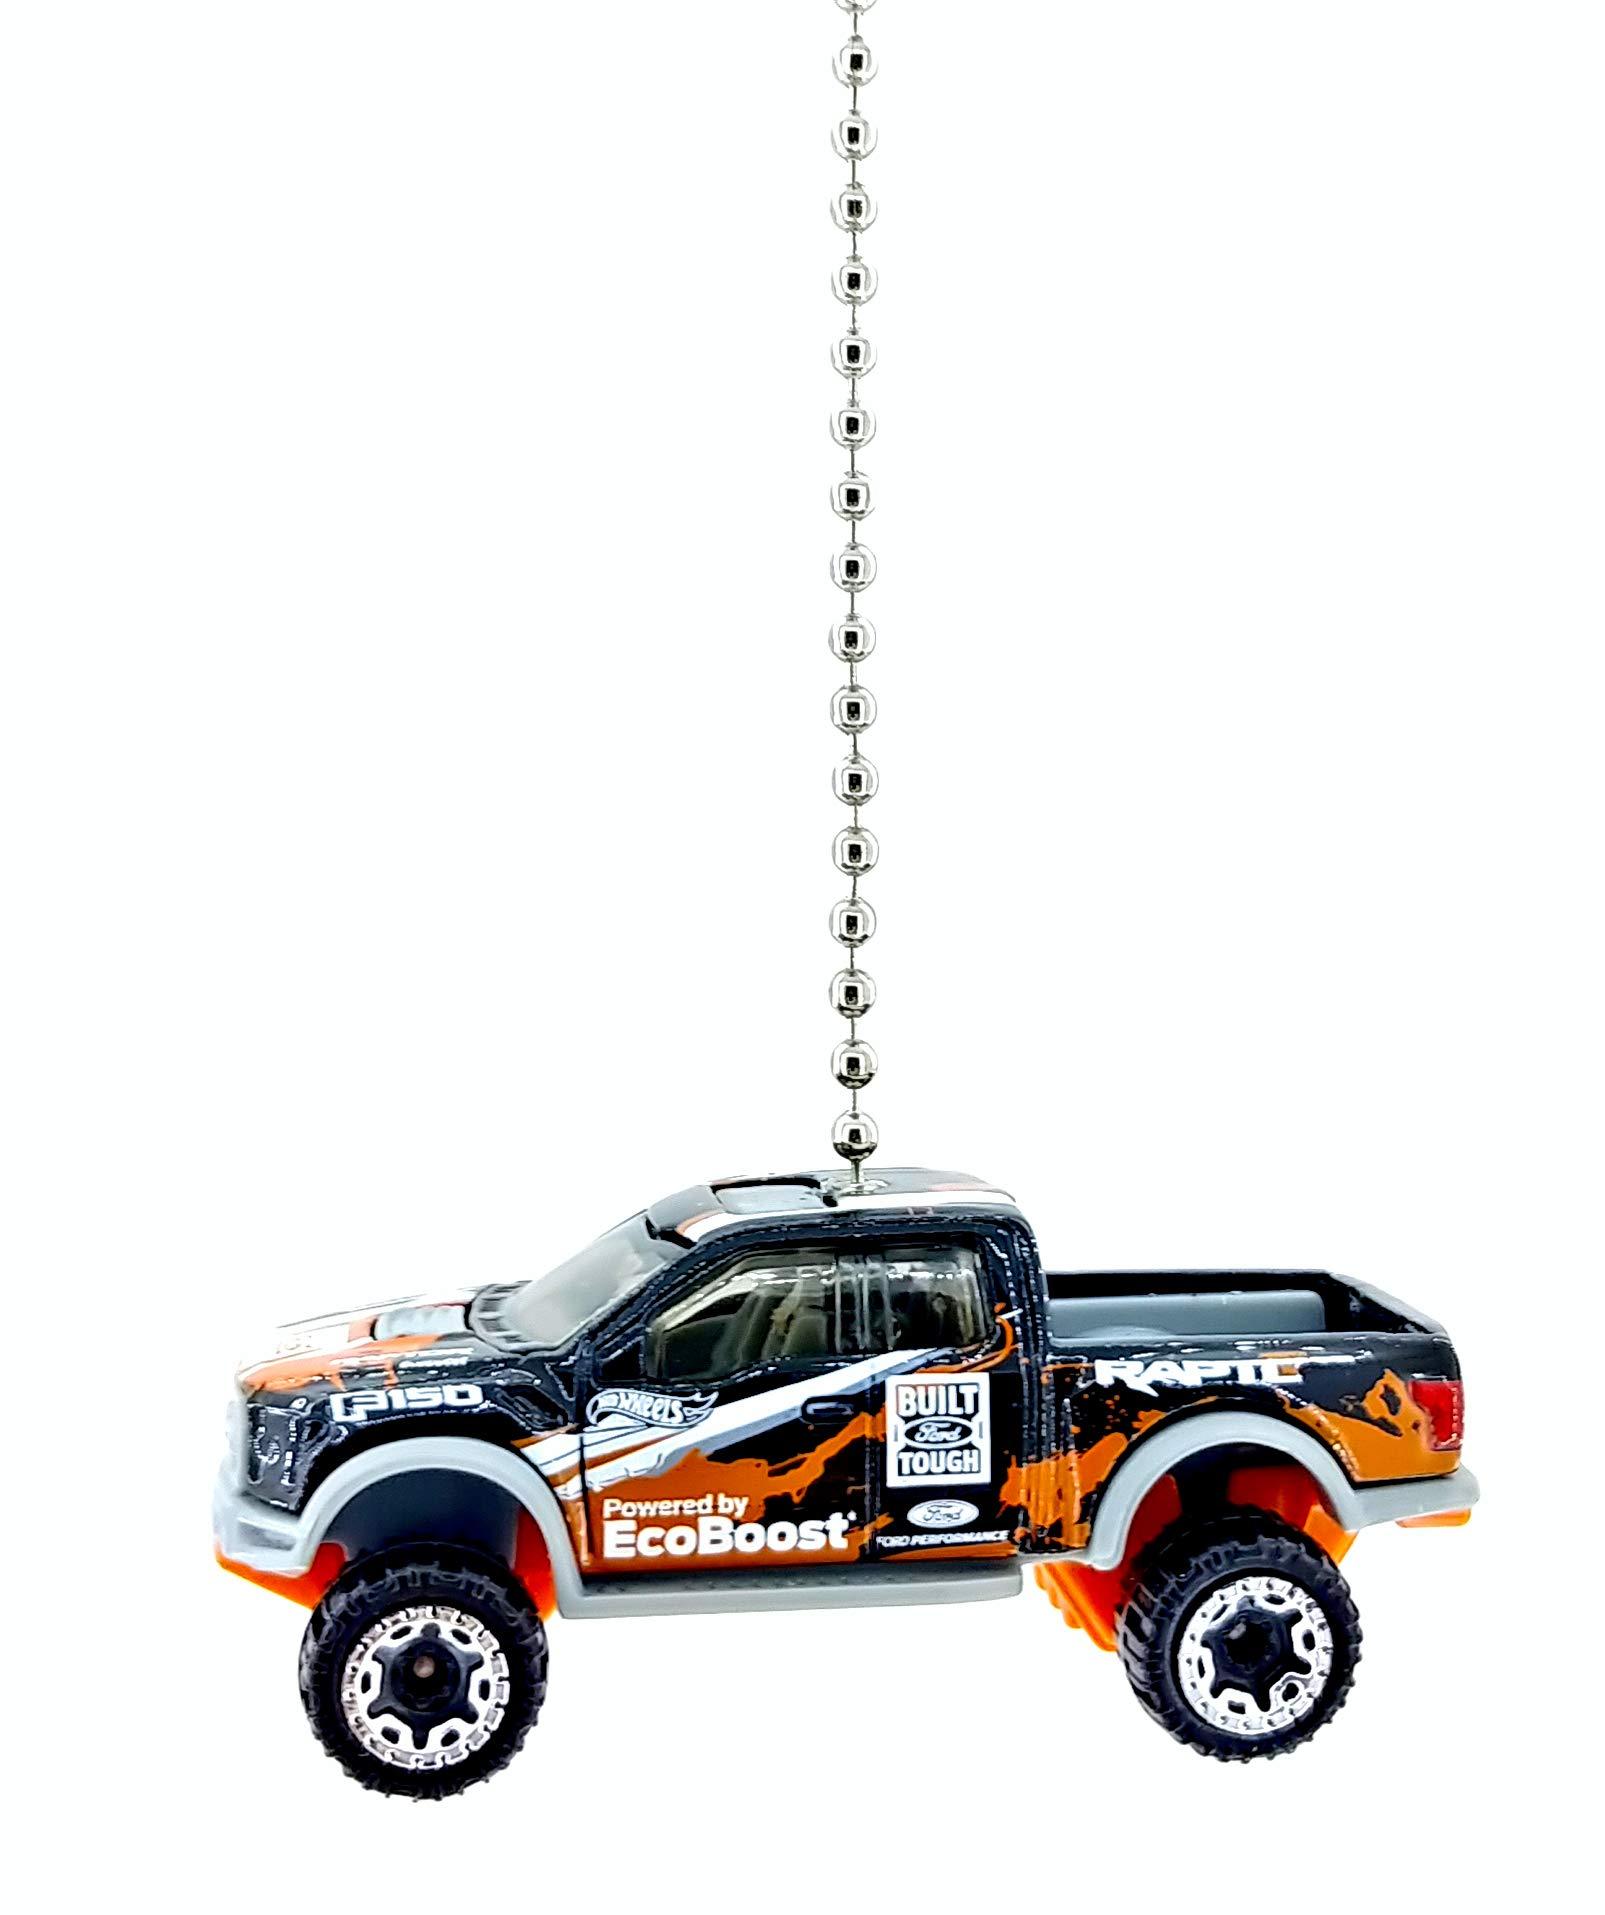 Ford Truck Diecast Ceiling Fan Pull Chain Ornaments 1/64 (2017 Ford F-150 Raptor Black Orange)